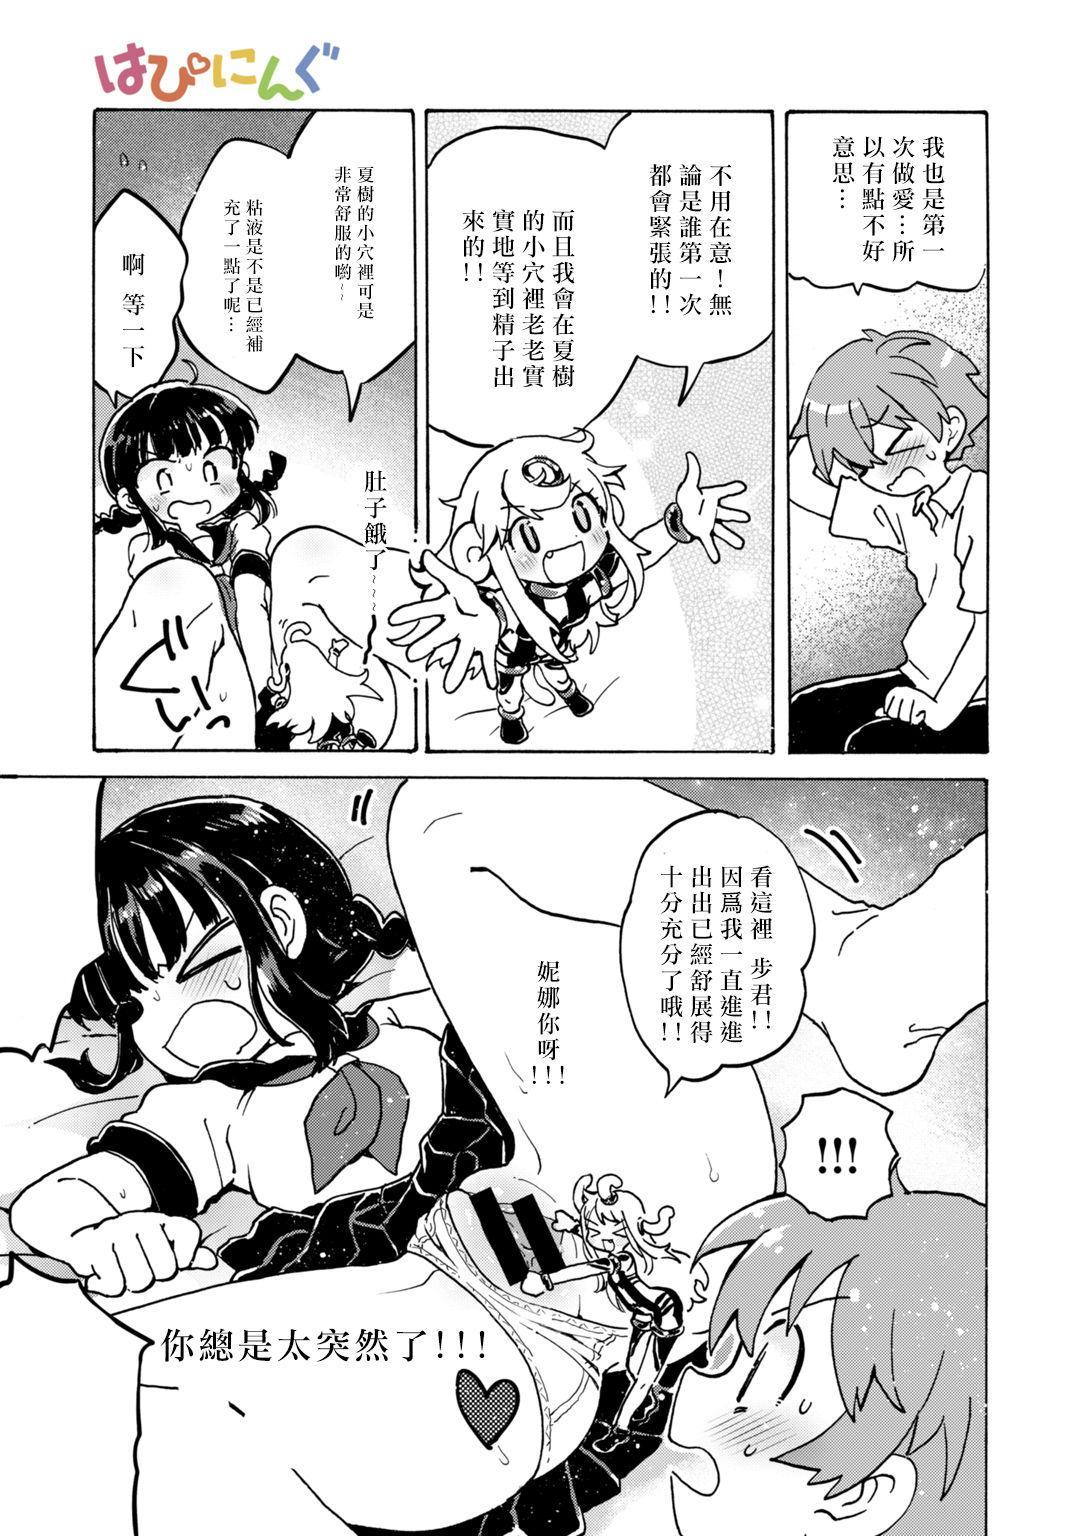 Chitsu no Naka kara Konnichiwa!! - Hello from the hole of love! 7